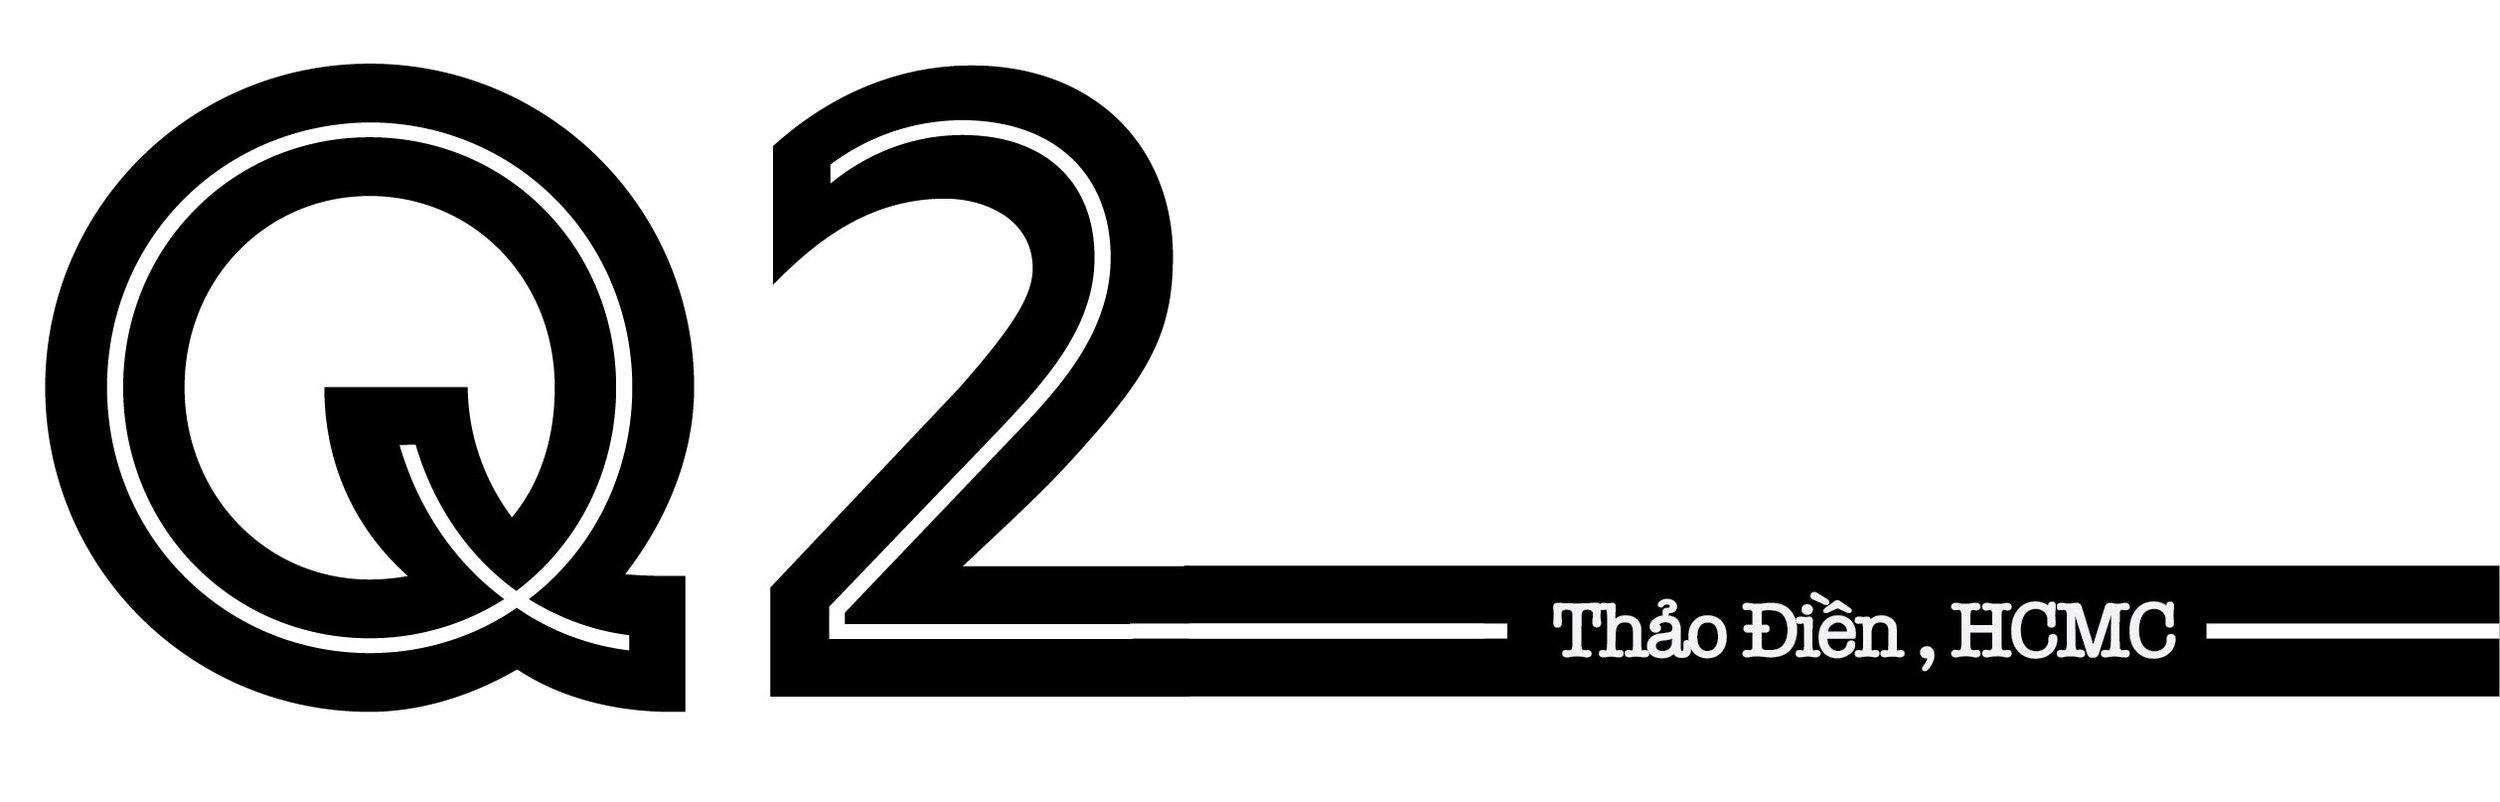 Q2-Thao-Dien-header.jpg